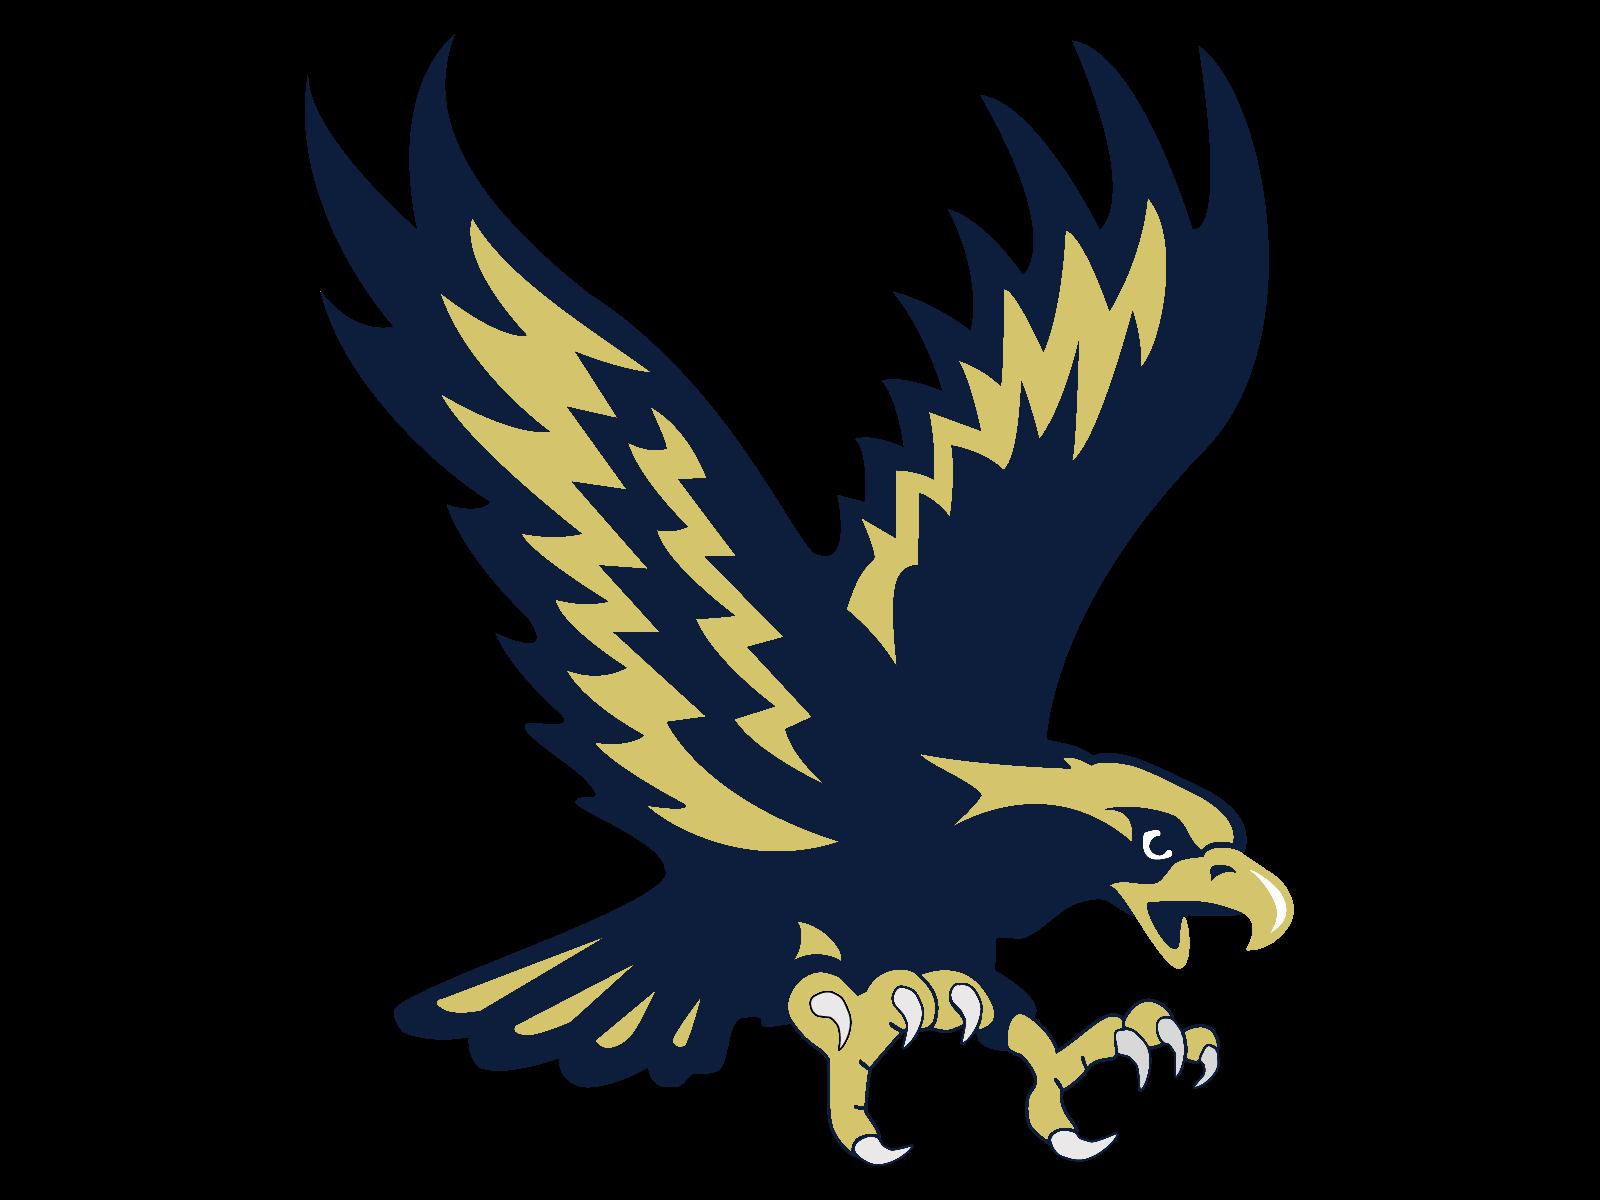 Hedgesville High School logo